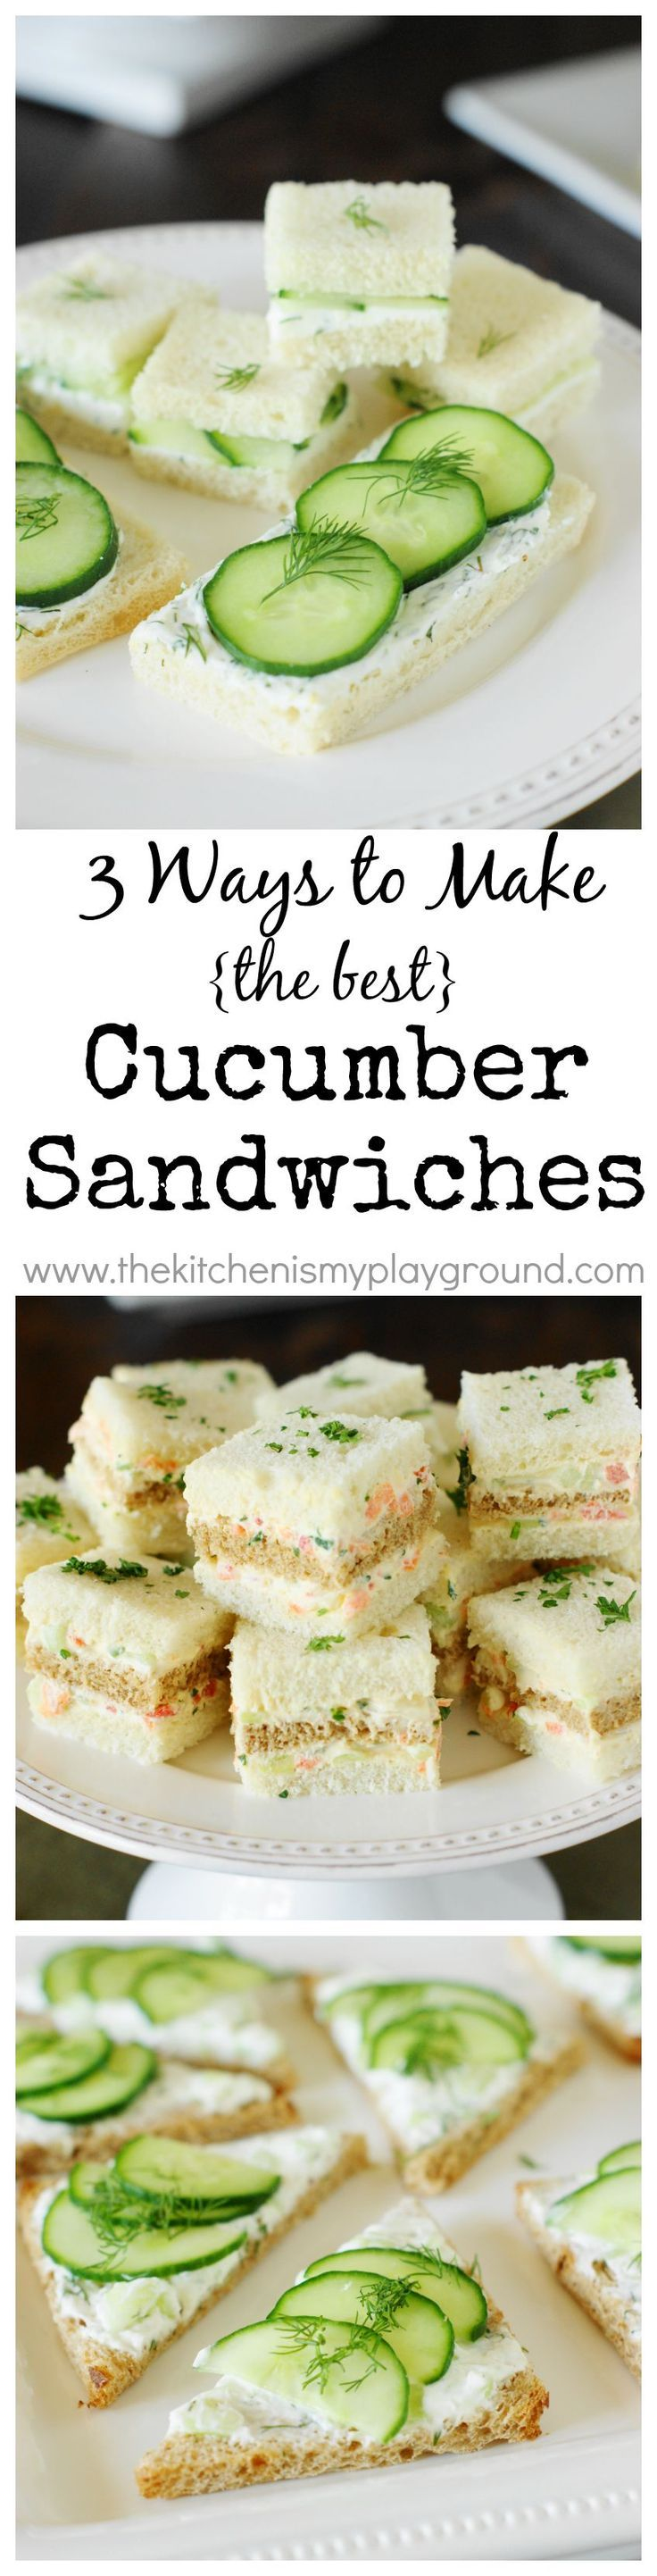 cucumber tea sandwiches 3 spreads 3 ways easy dinner recipes pinterest teeparty. Black Bedroom Furniture Sets. Home Design Ideas